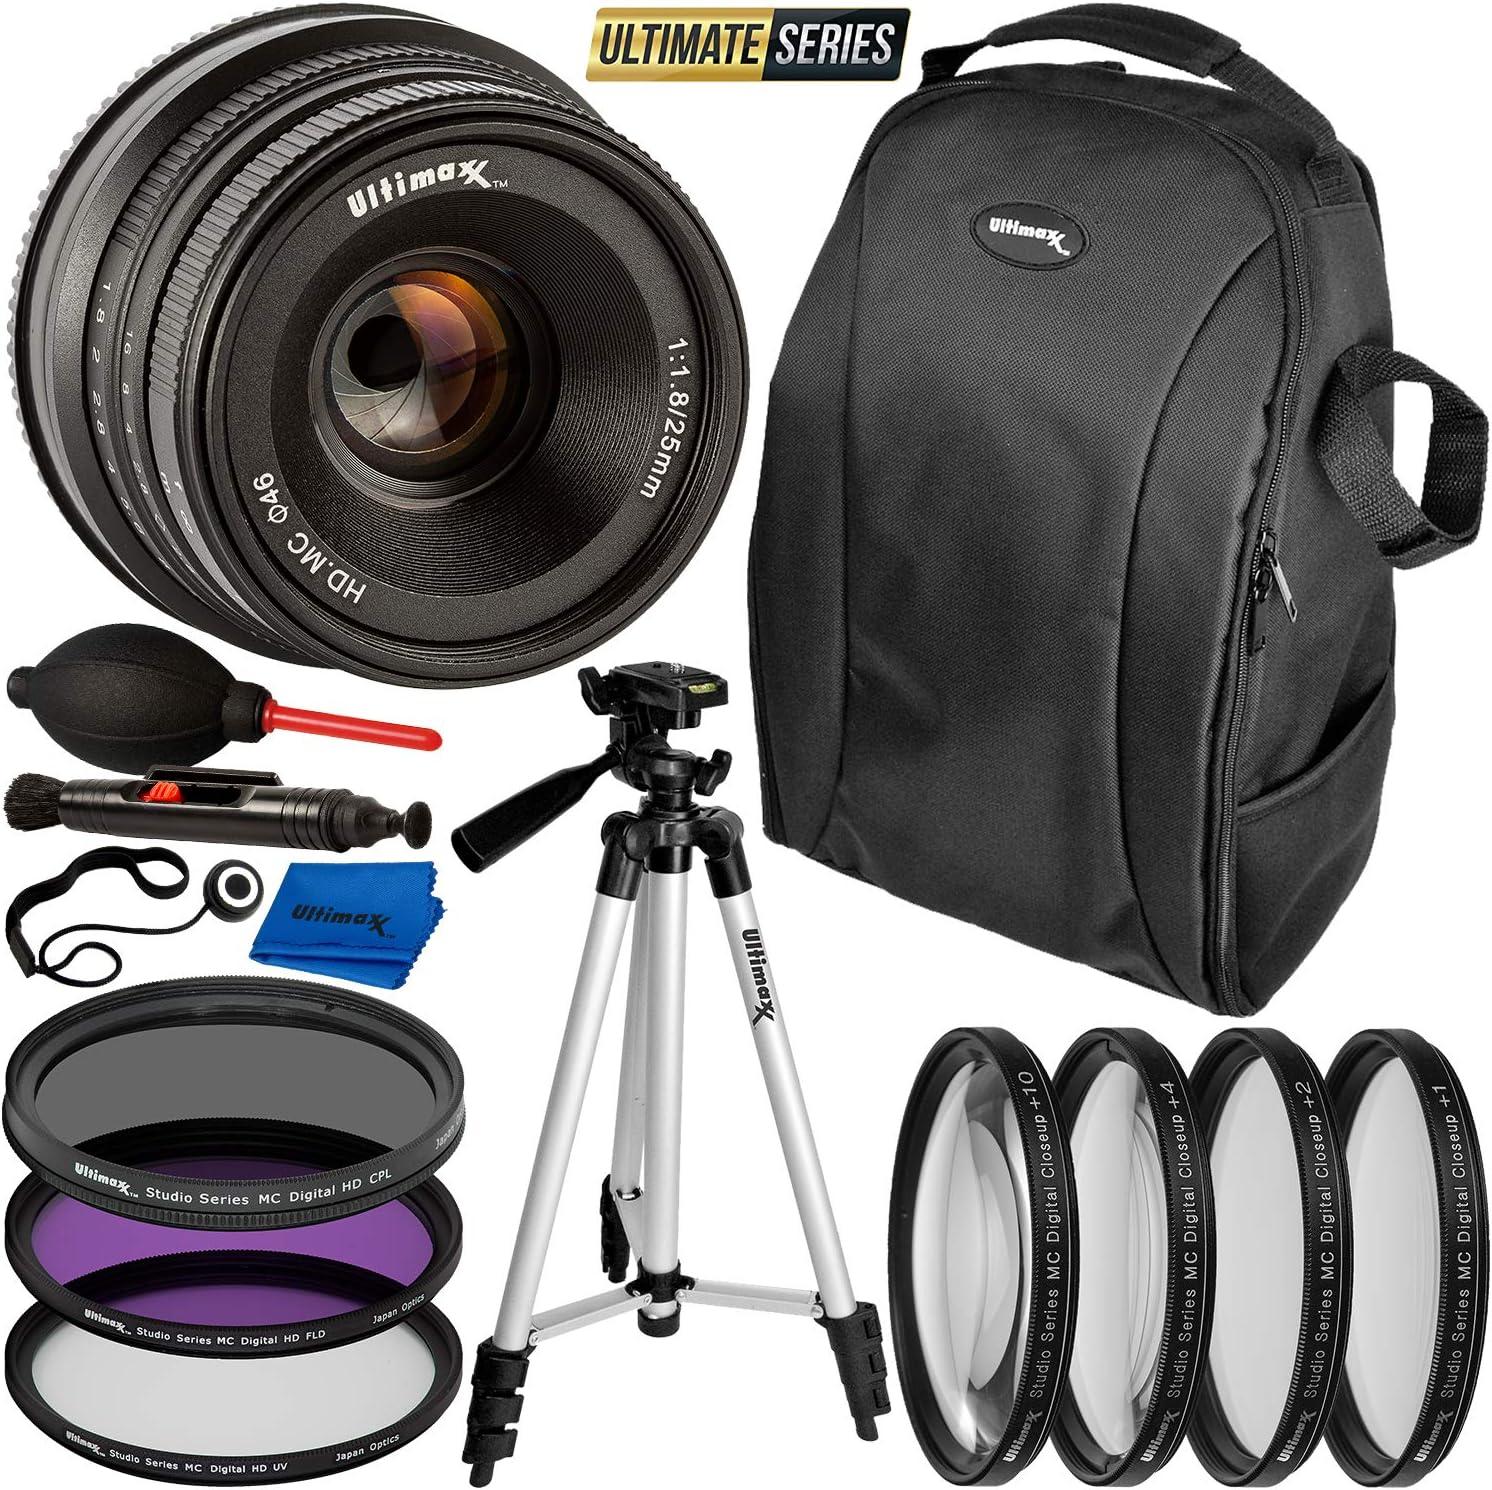 a99II a6000 A7RIII a3000 A7 A7III A7R a5100 a9 a6300 A7II Ultimaxx 25mm f//1.8 Manual Lens Kit for Sony FS7 a6500 a5000 A7SII FS7M2 NEX Series /& Other E-Mount Cameras FS5M2K FS5